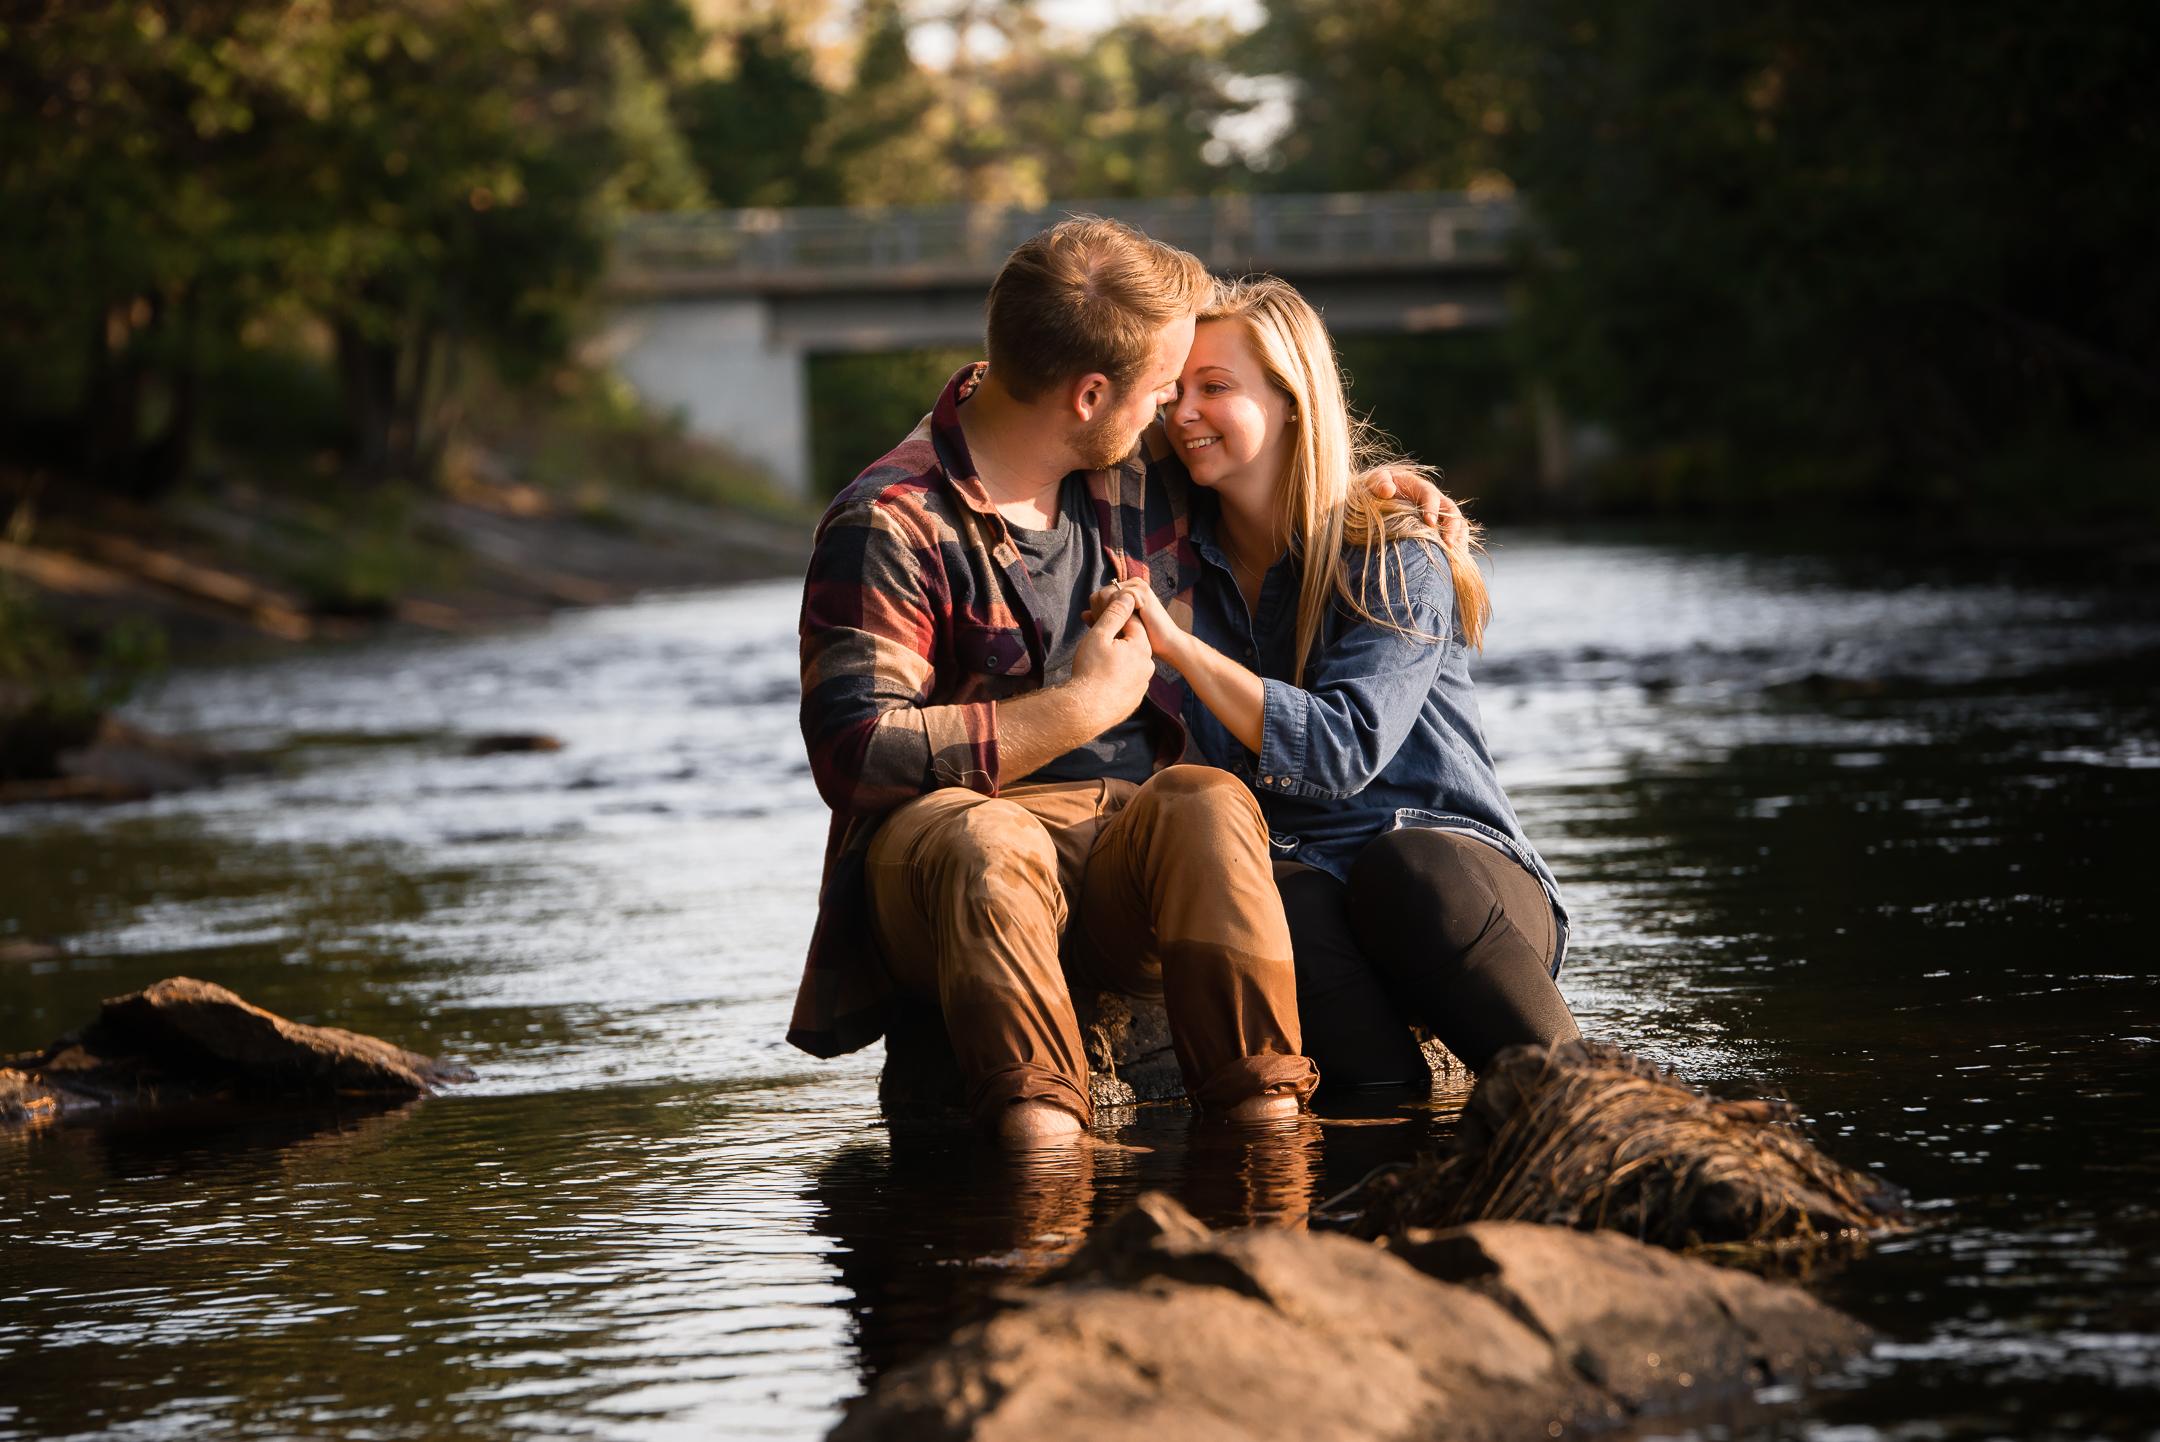 Naomi Lucienne Photography - Couples - 170923600.jpg